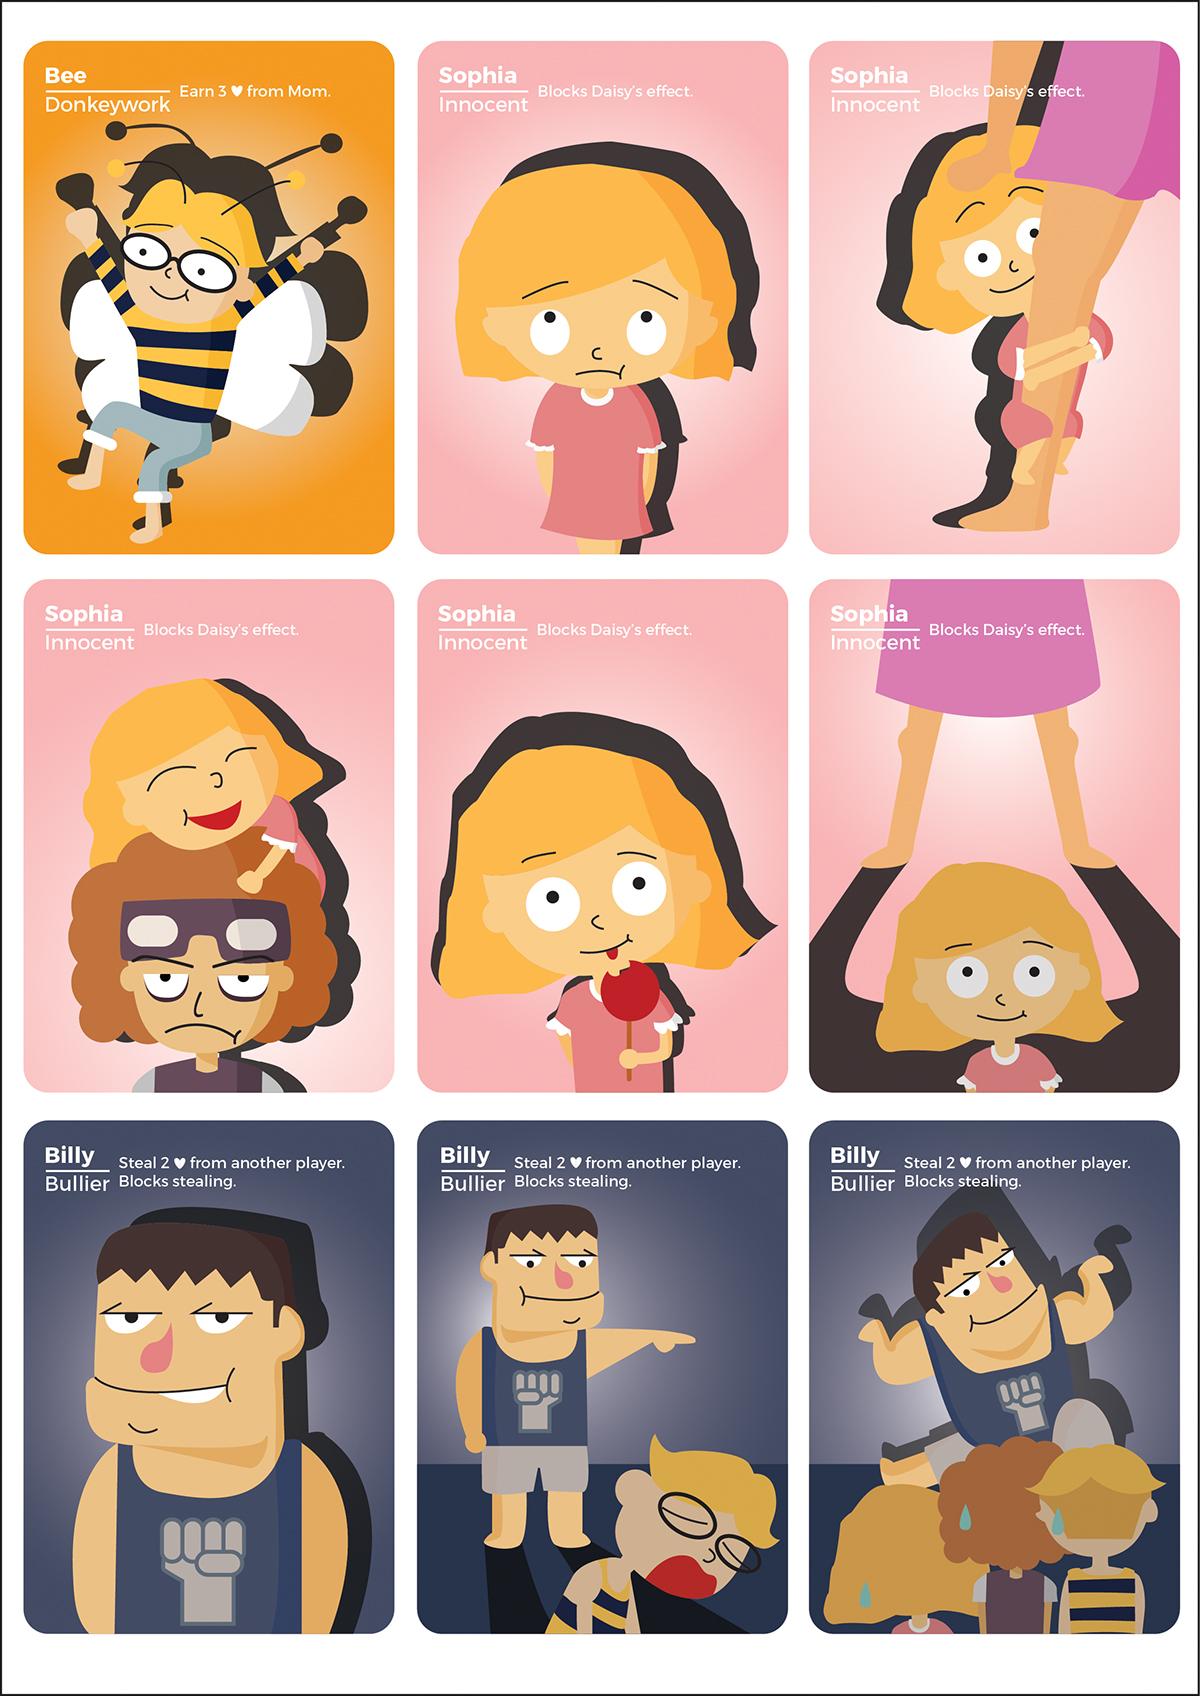 graphic design ,design principles,Visual Communication,ILLUSTRATION ,Games